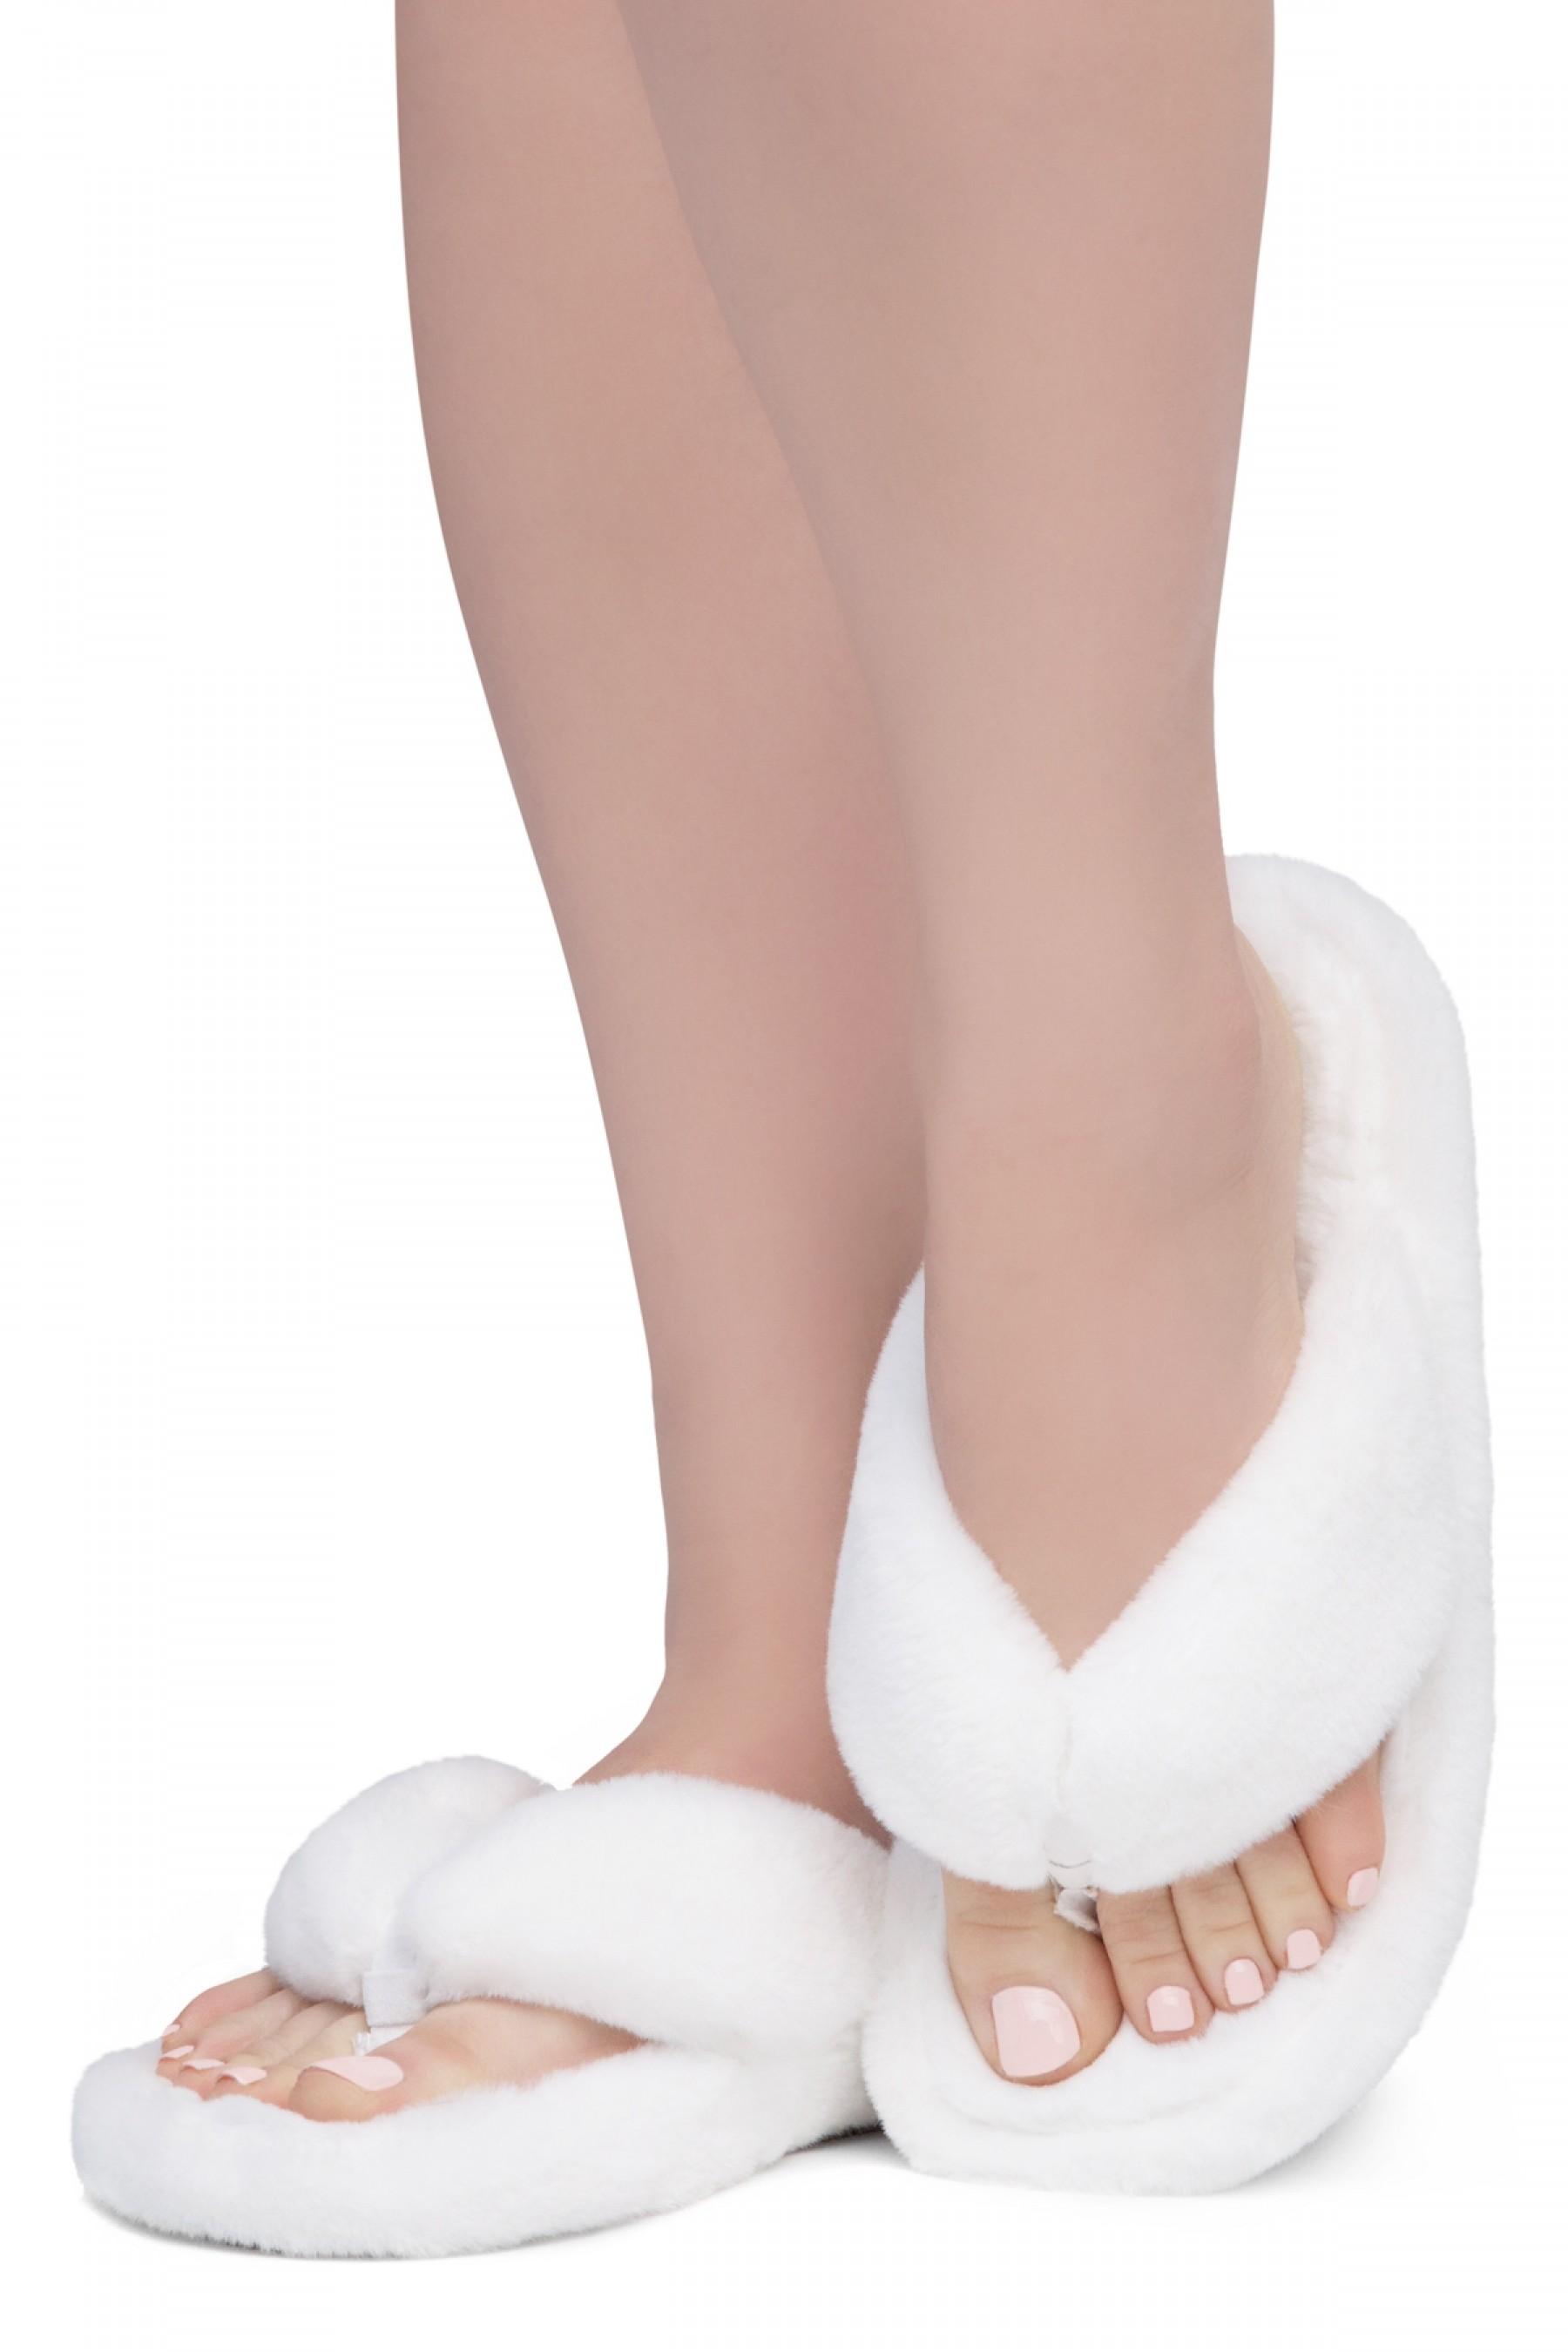 Shoe Land LESSA Women's Cozy Memory Foam Spa Thong Flip Flops Fluff Indoor Slippers Fuzzy Platform Wedge Sandals(2020White)